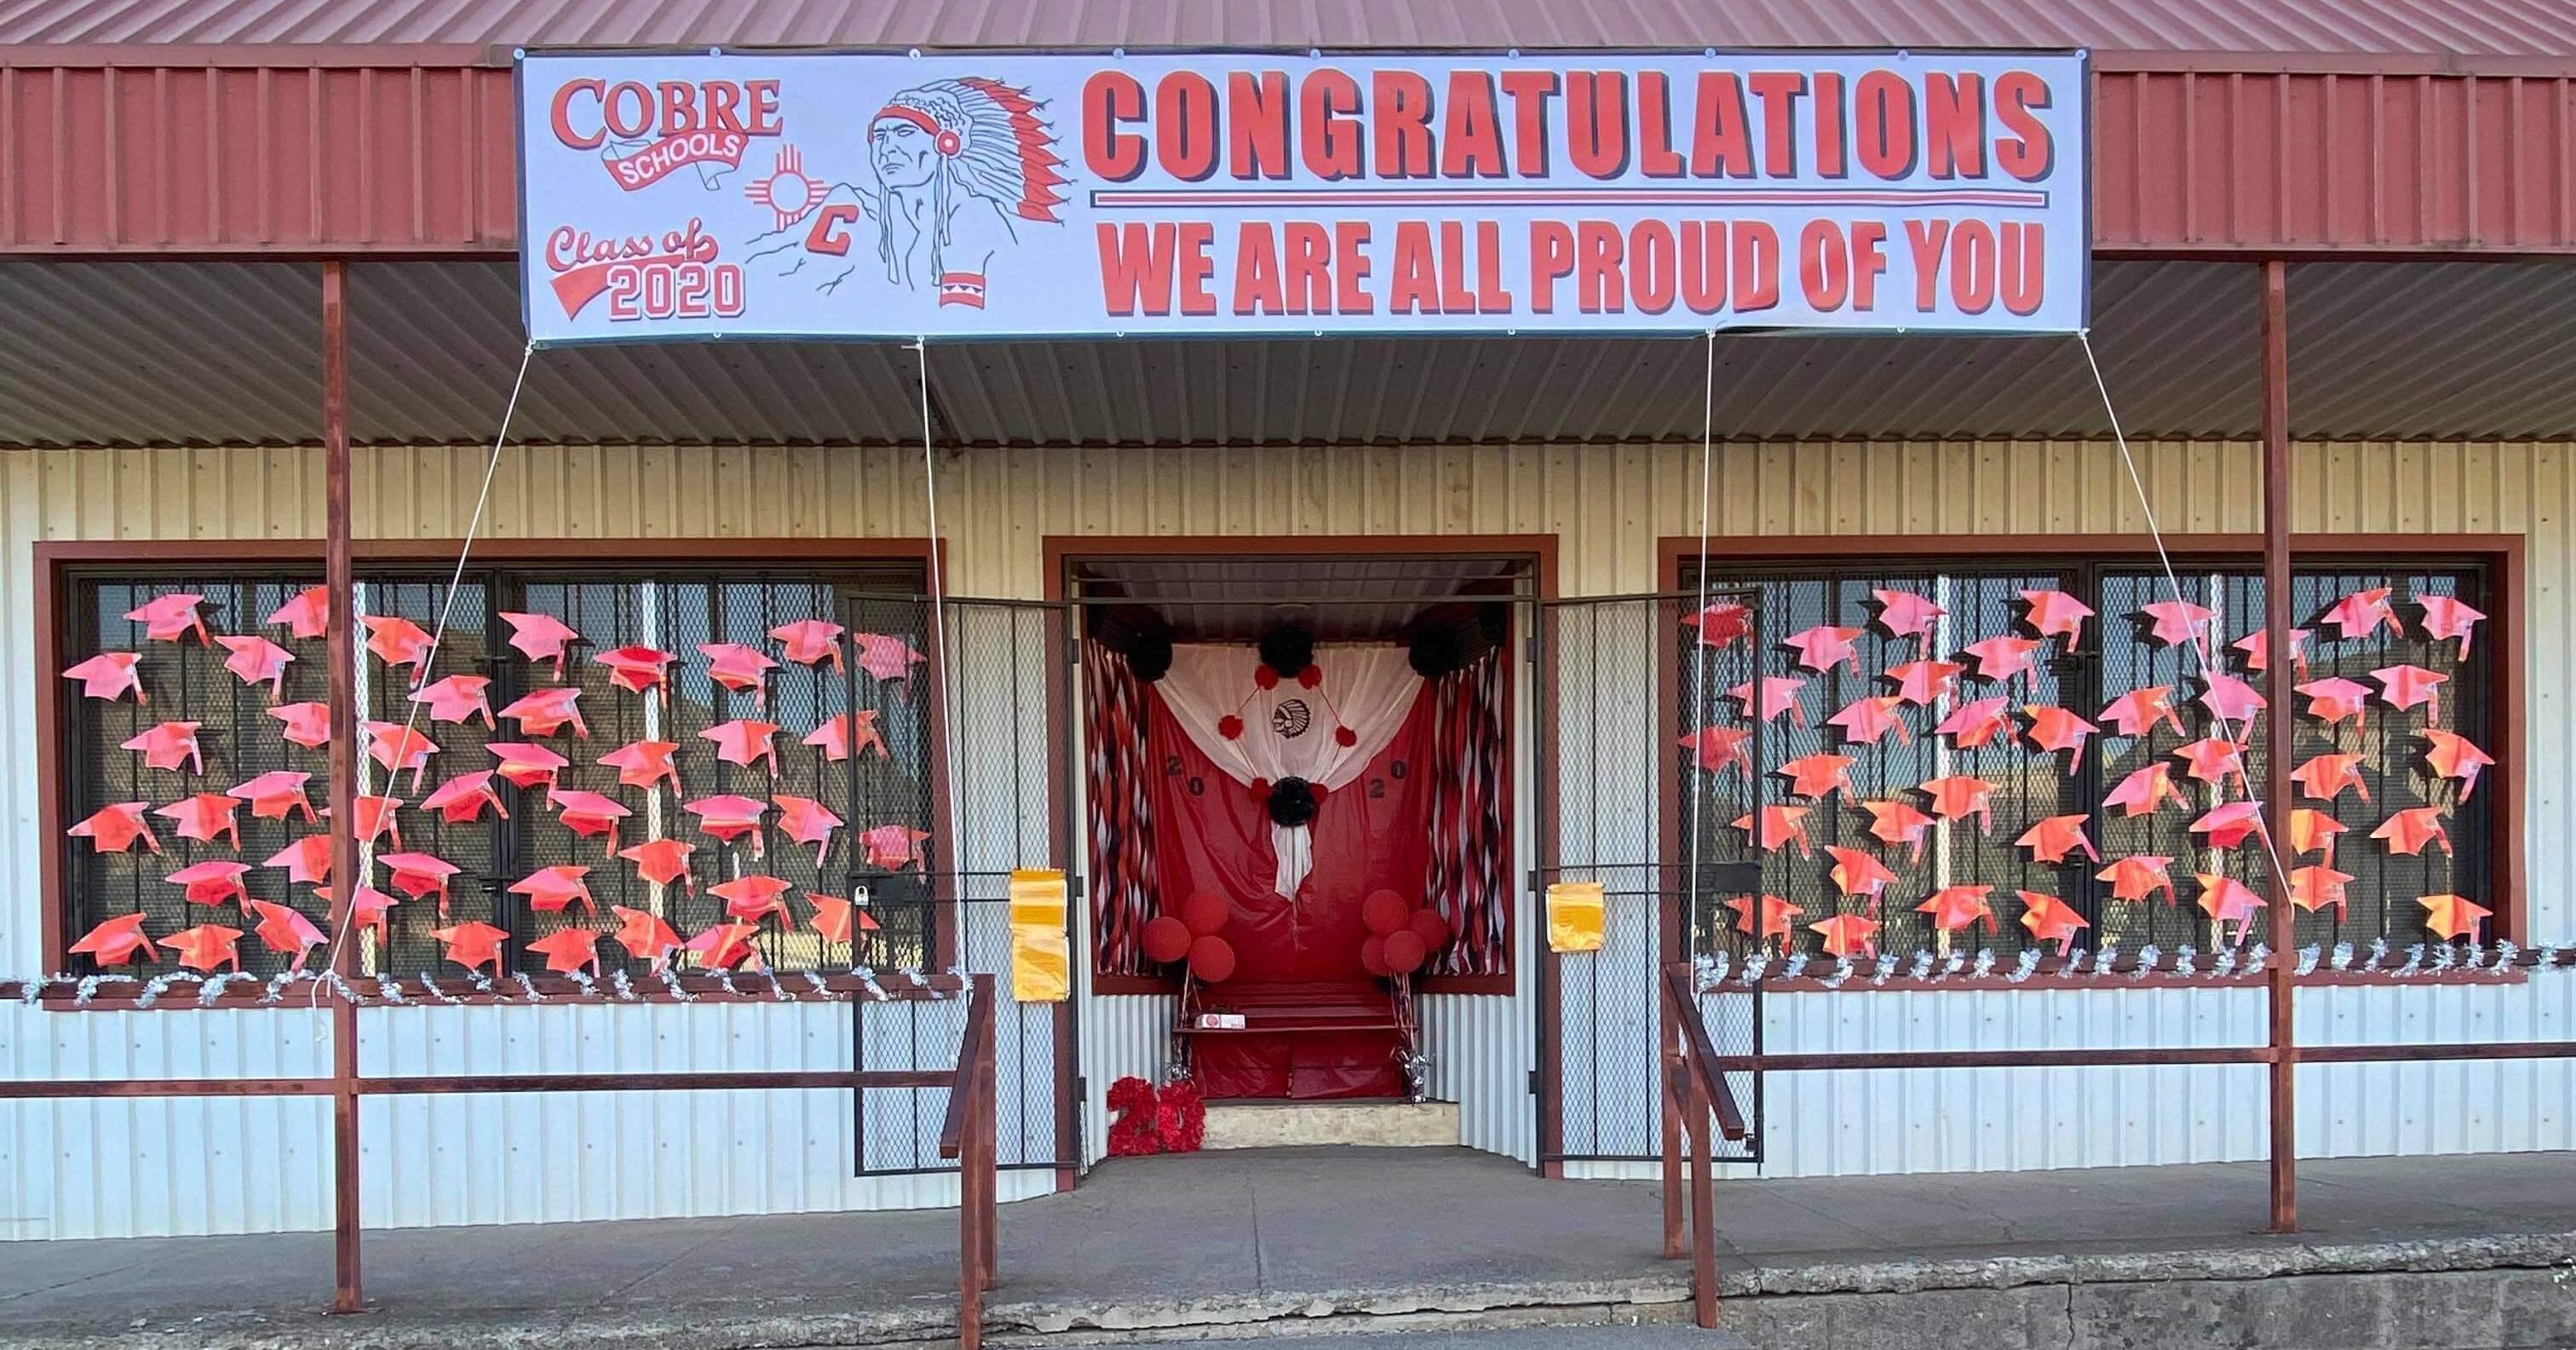 Anna Villalobos Graduation Storefront Photo Booth for Cobre High School Class of 2020